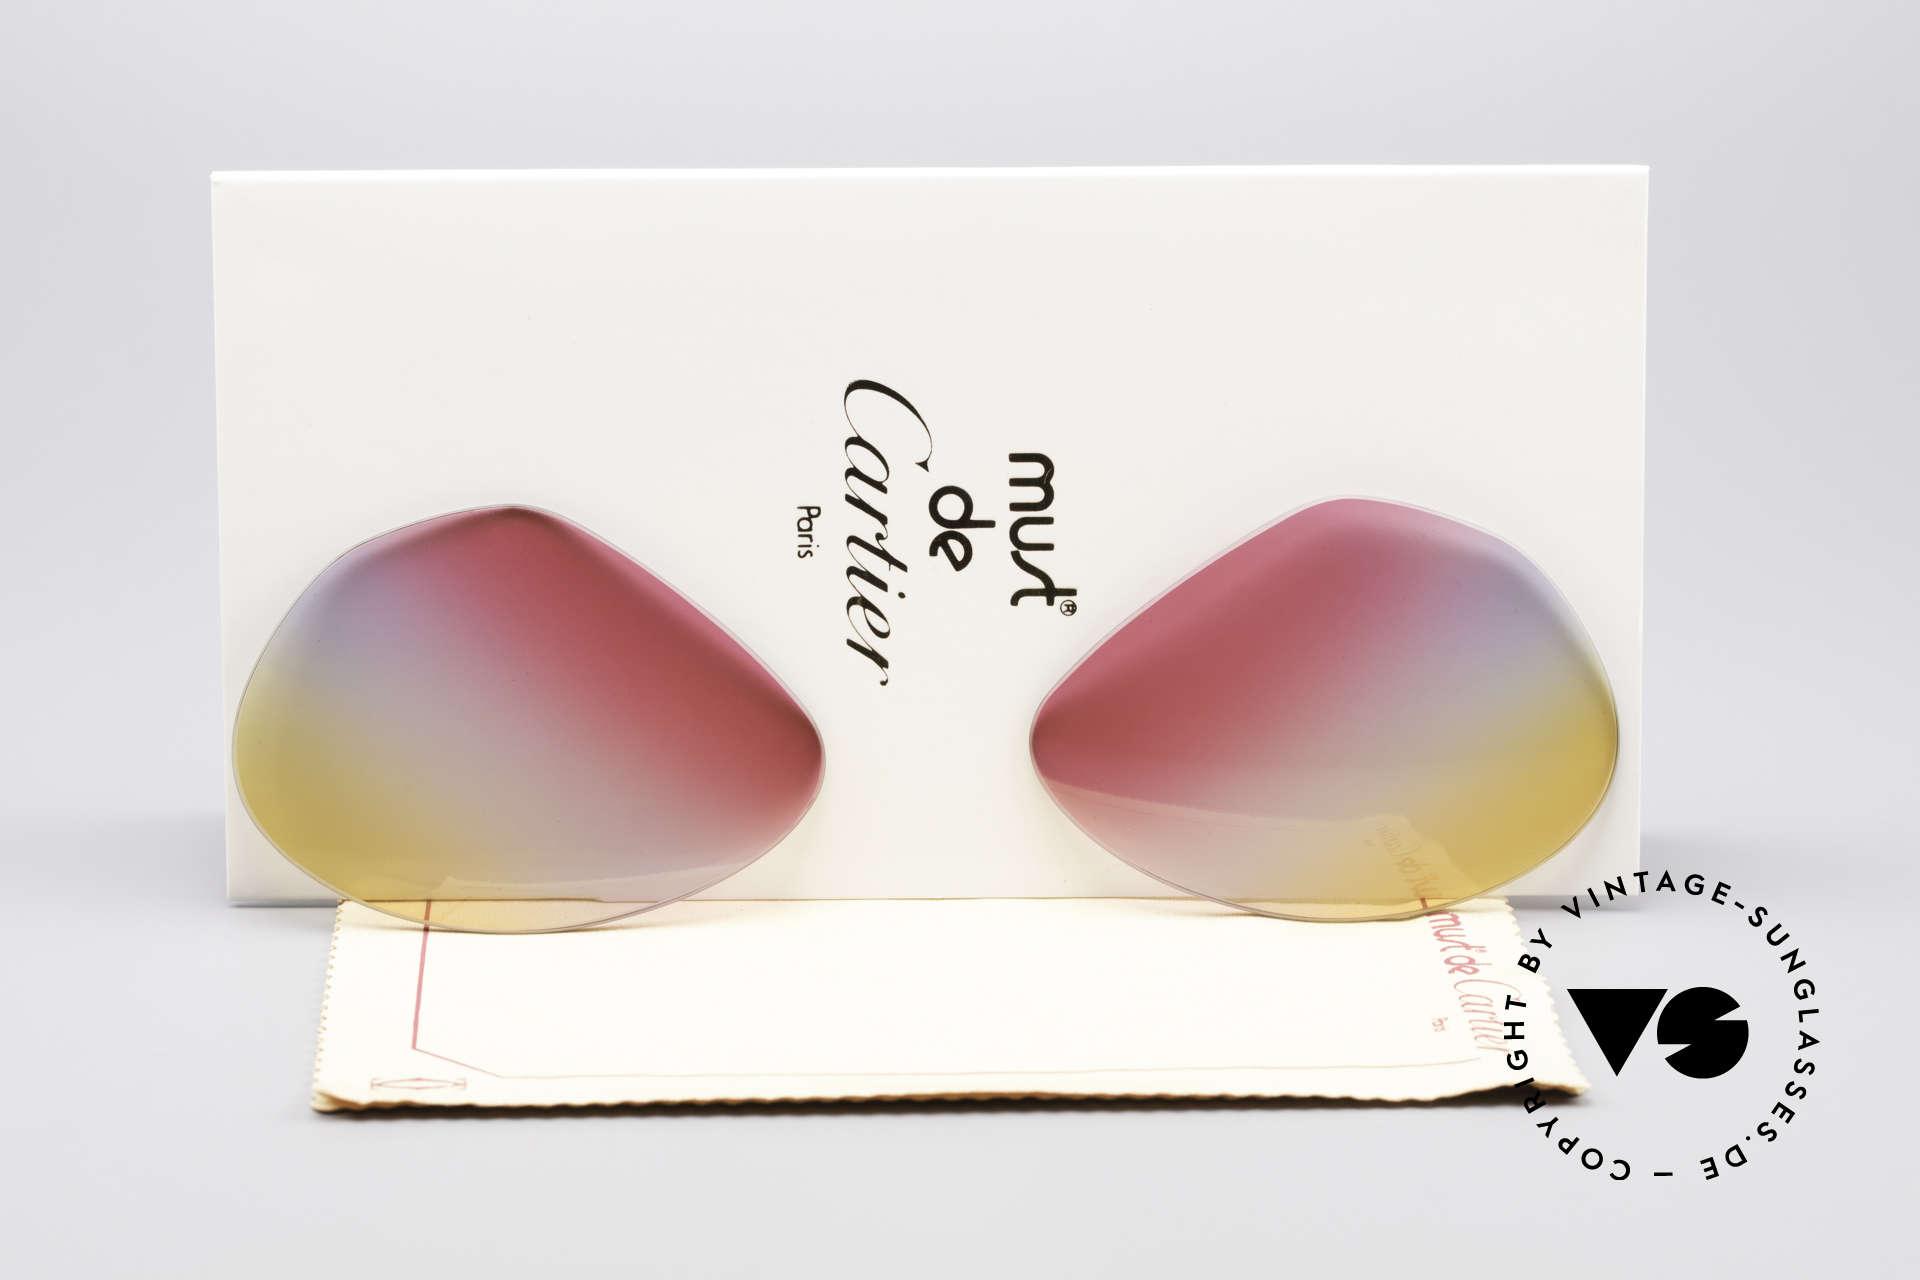 Cartier Vendome Lenses - L Tricolored Sunrise Lenses, replacement lenses for Cartier mod. Vendome 62mm size, Made for Men and Women